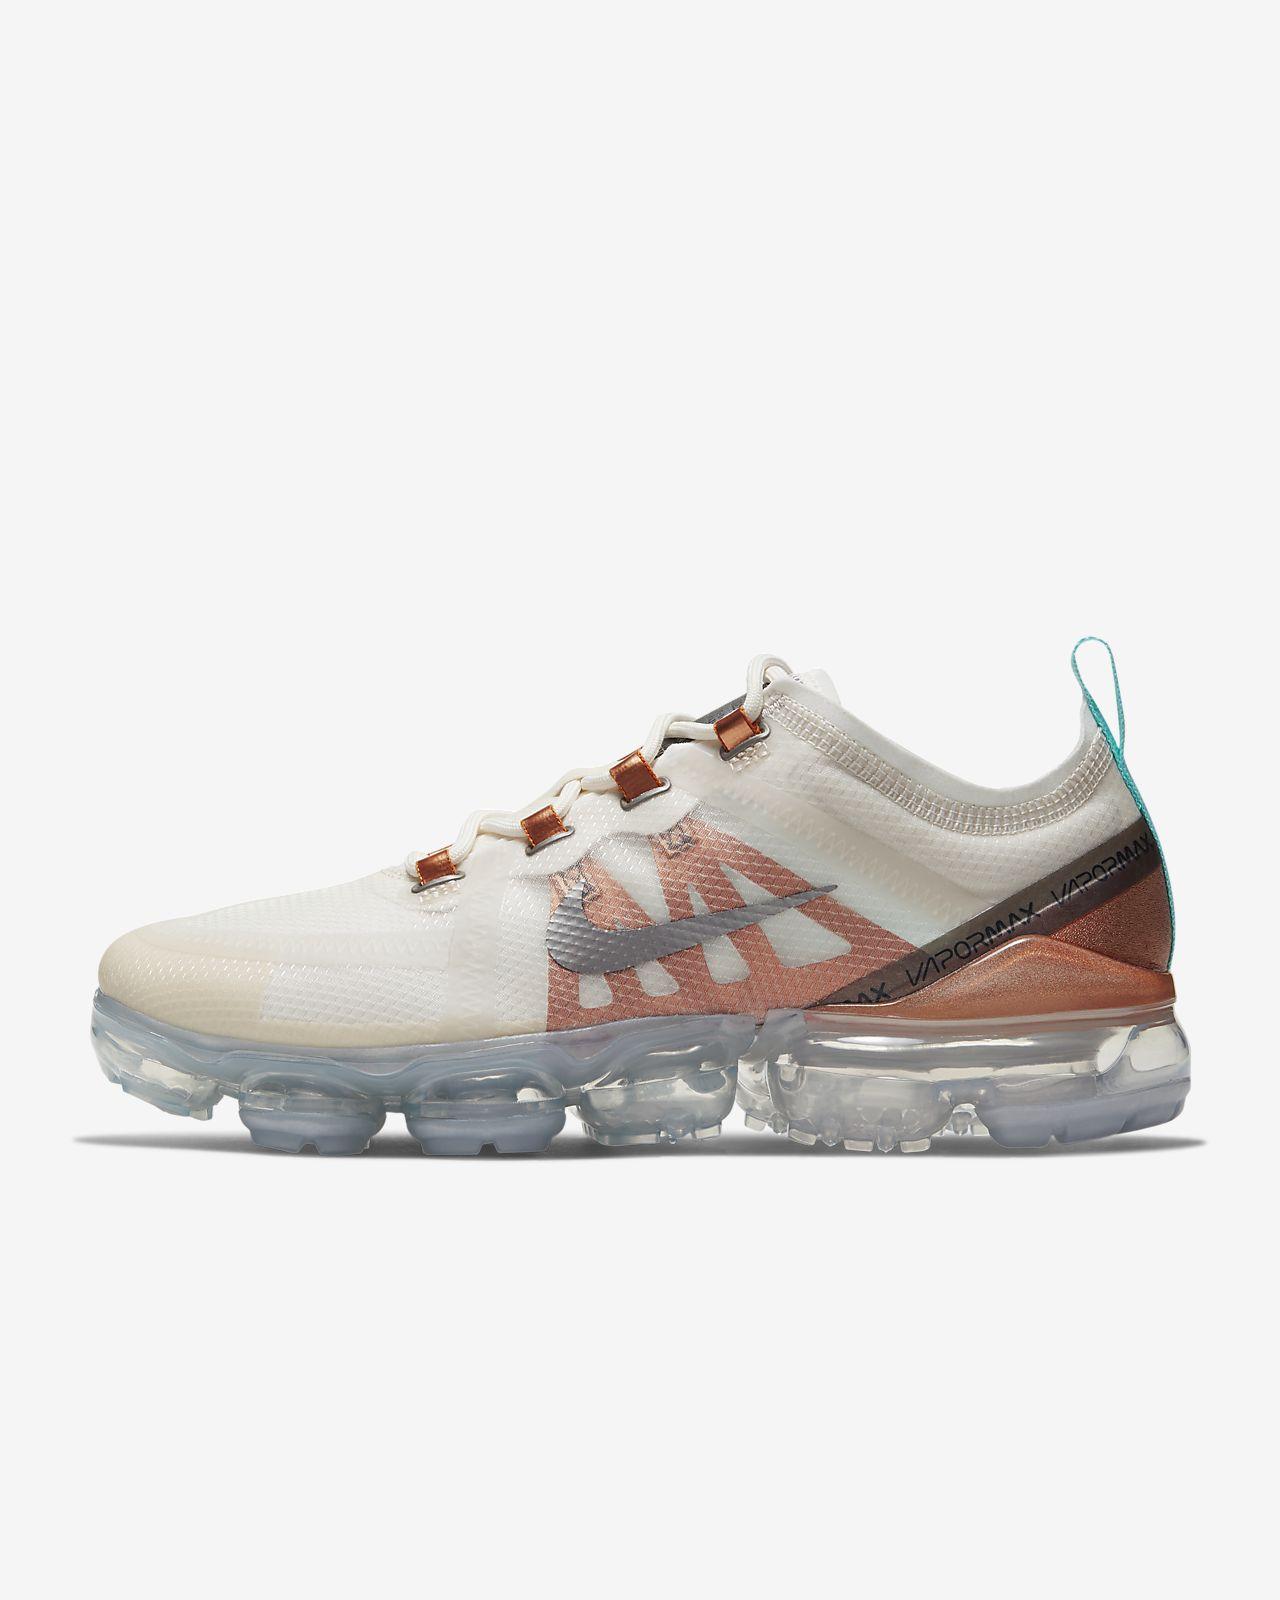 Nike Air VaporMax 2019 SE 女子运动鞋